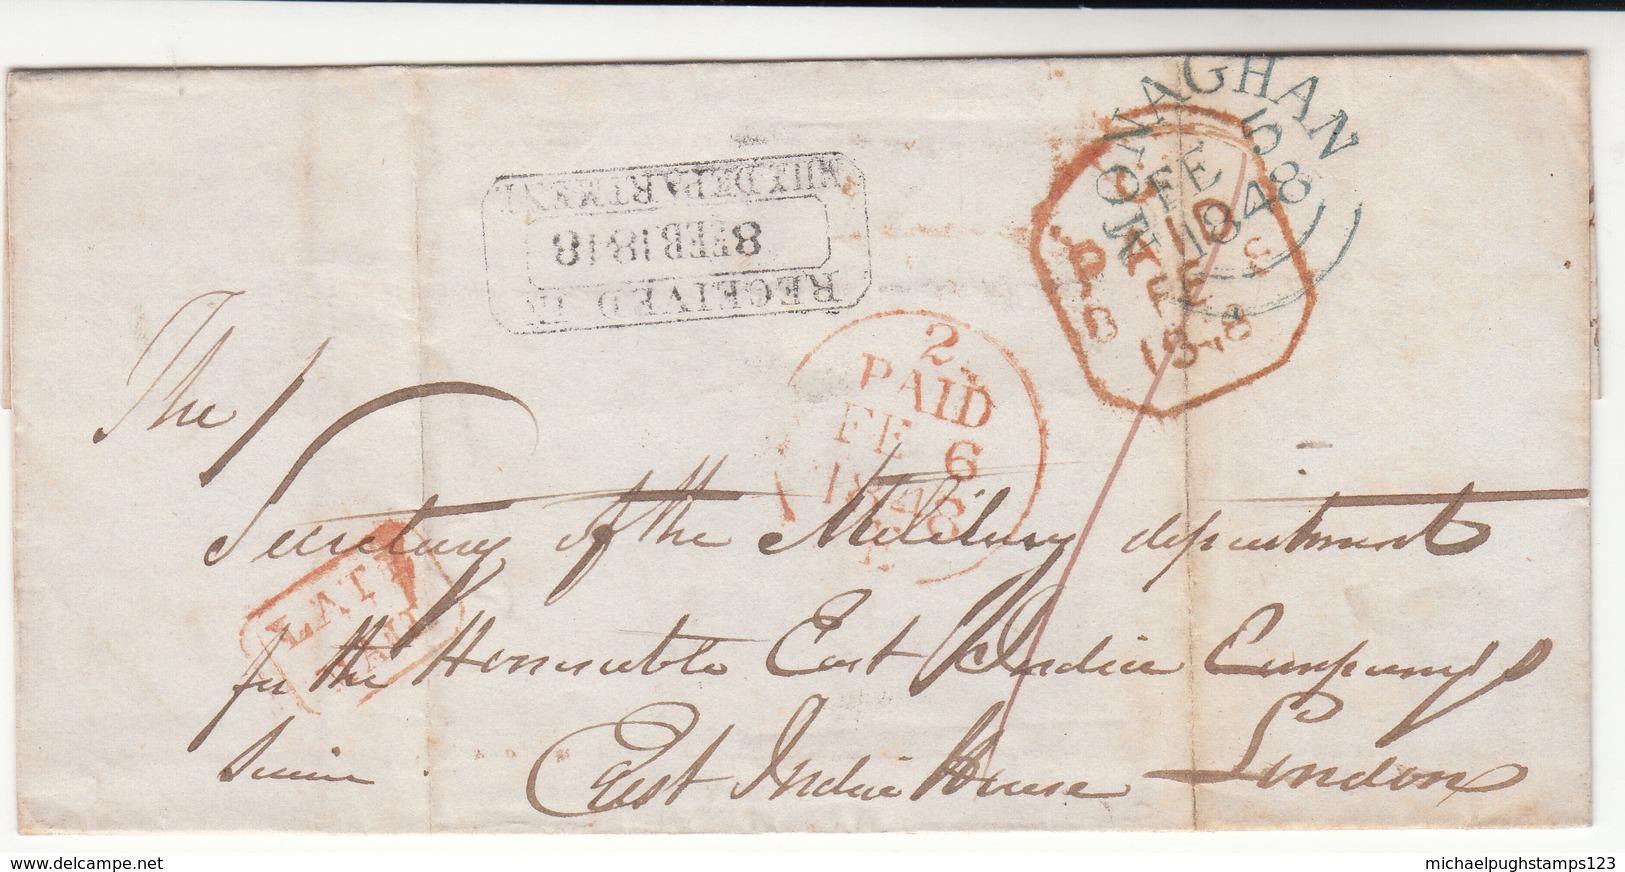 Ireland / County Monaghan / Late Mail / London / East India Company - Ireland